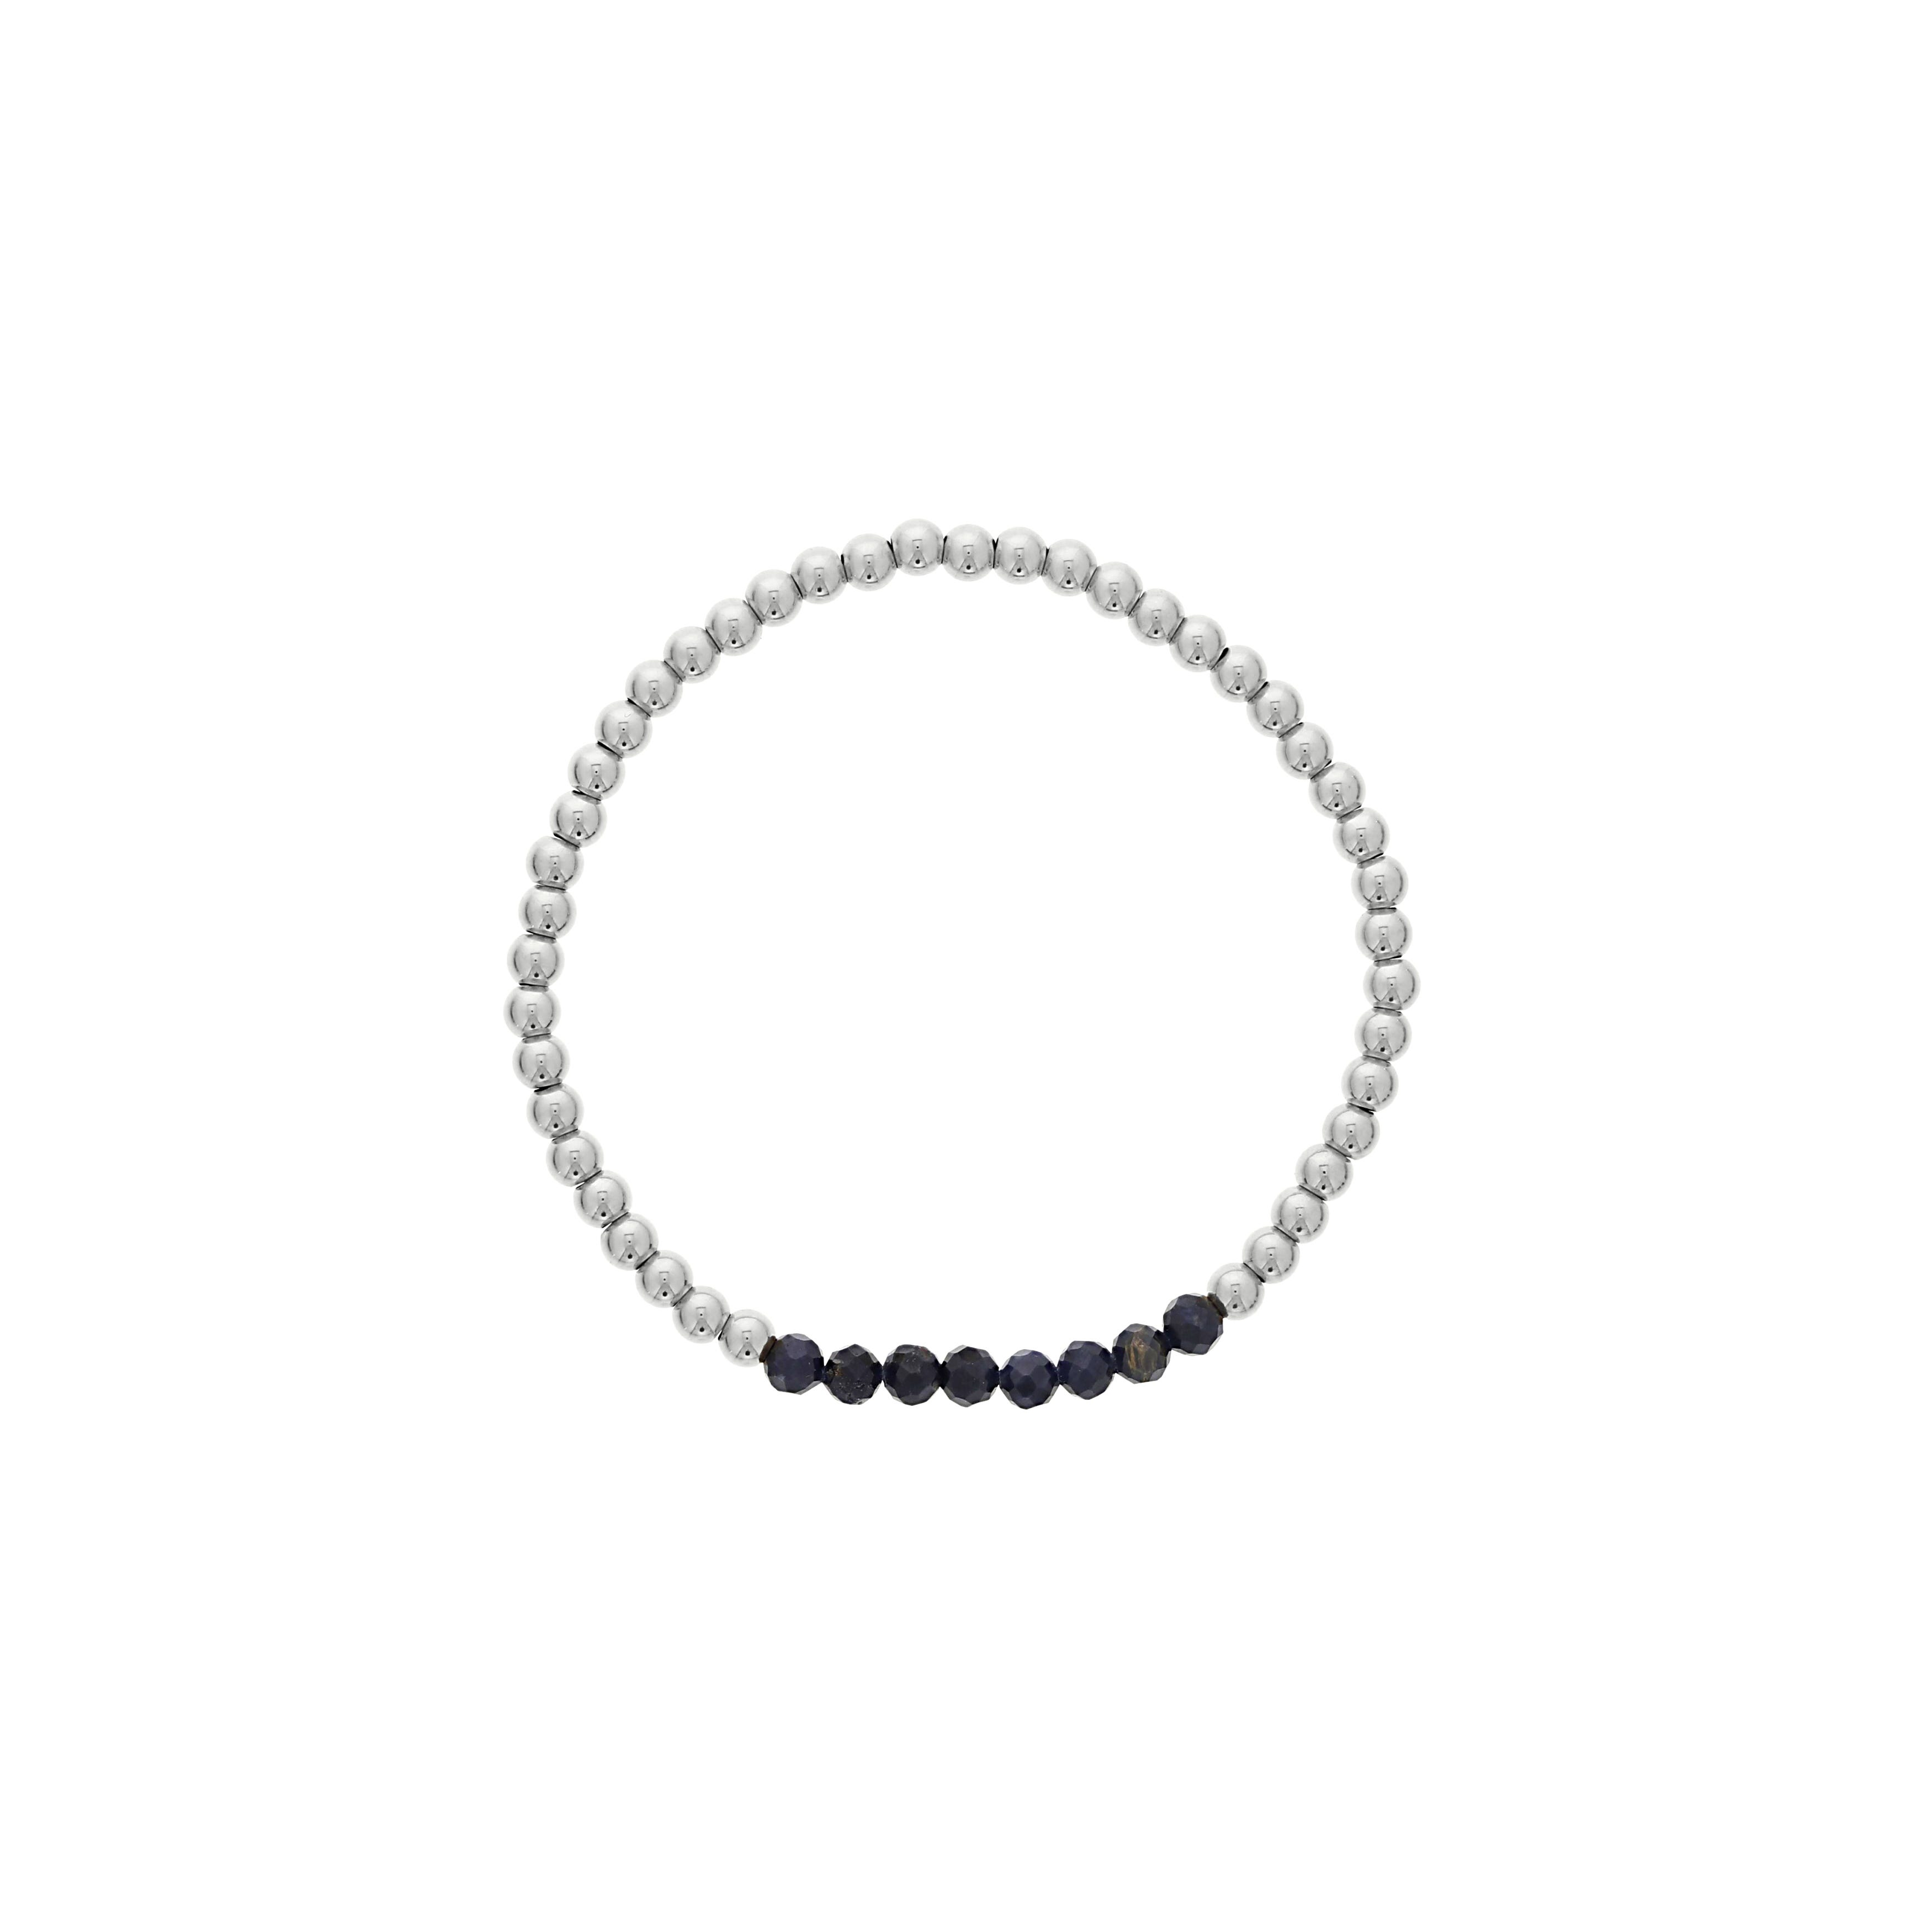 Blue Sapphire Birthstone Beaded Bracelet in Sterling Silver